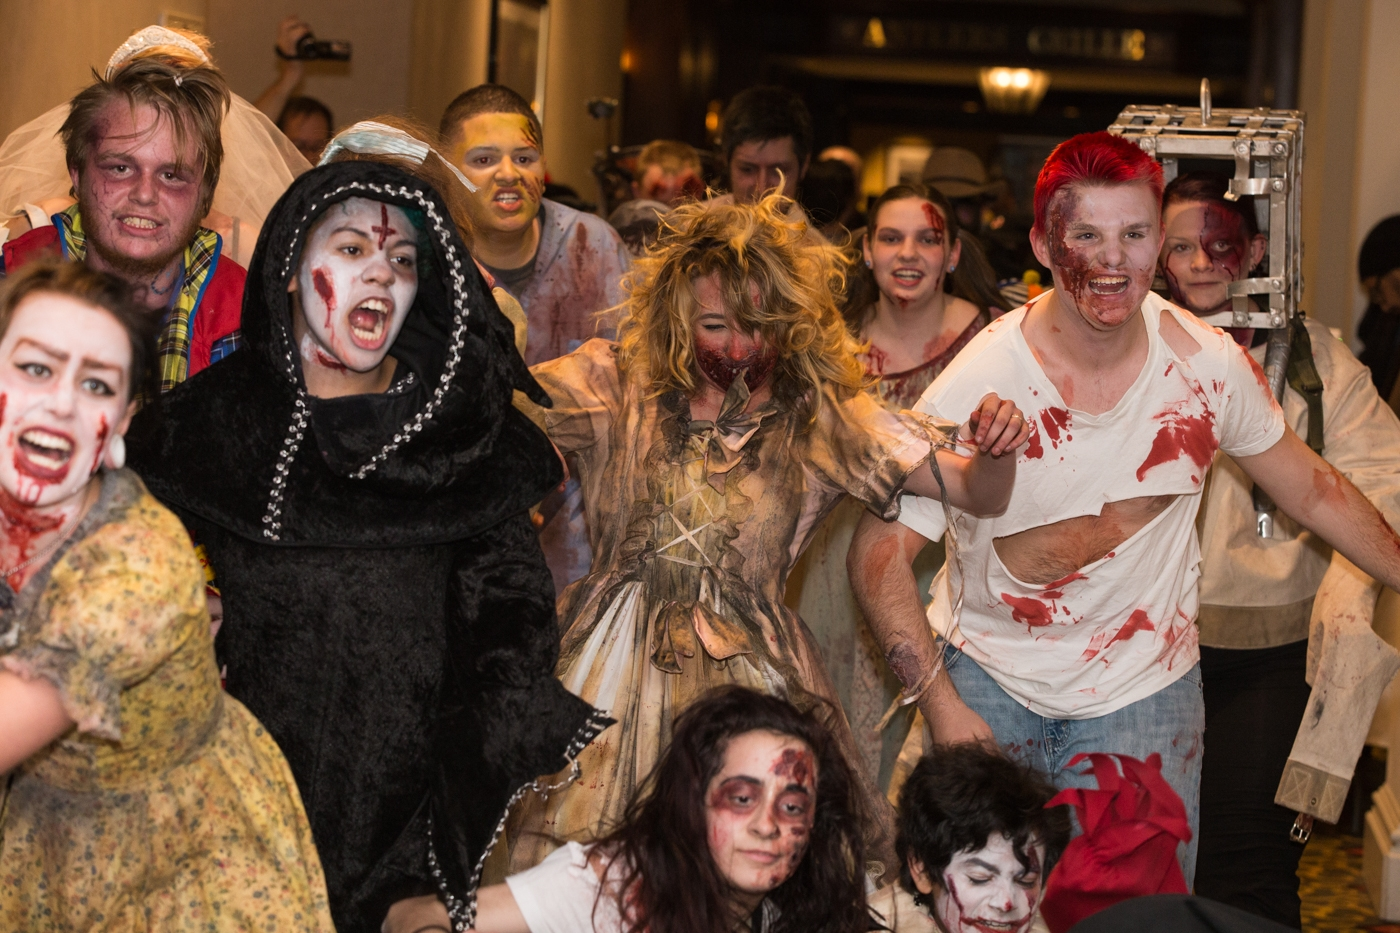 Zombie Crawl photo by: Bryan Ra